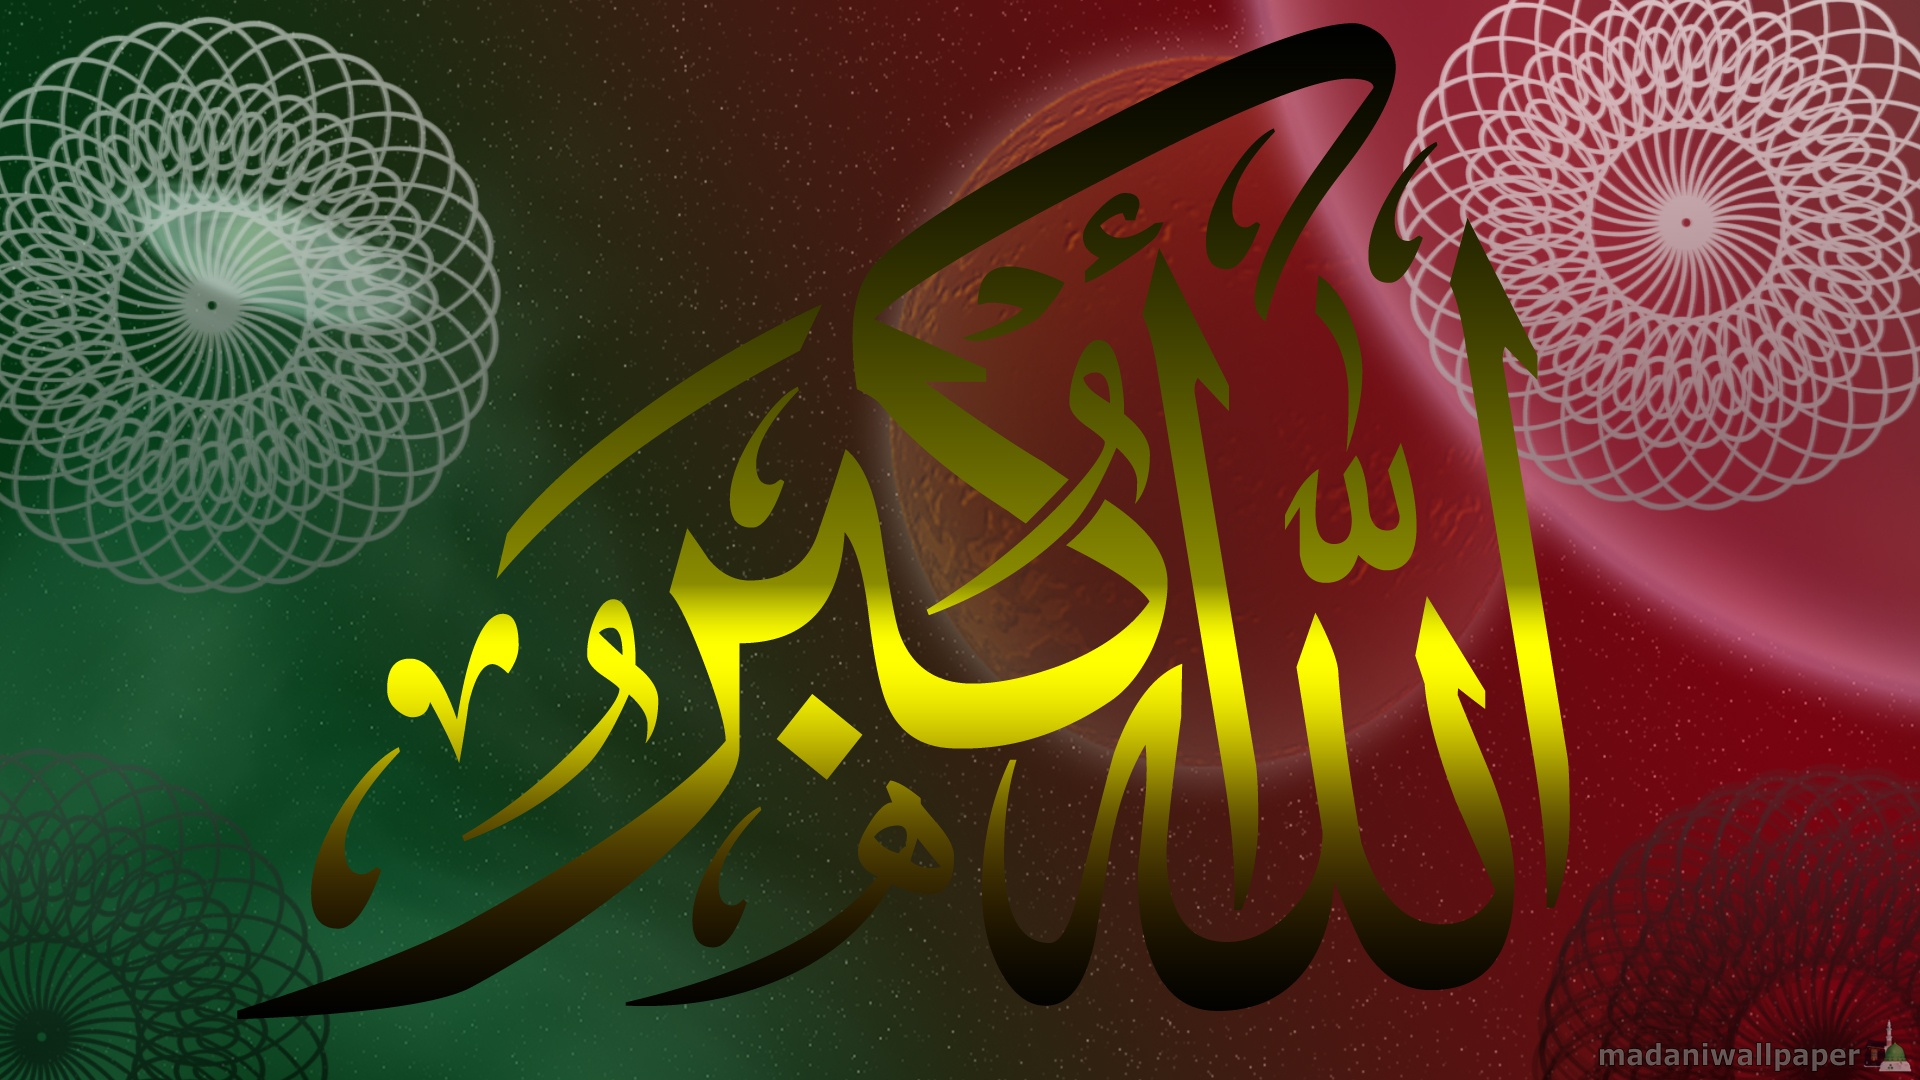 How to set New HD Allah o Akbar Wallpaper wallpaper on your desktop 1920x1080